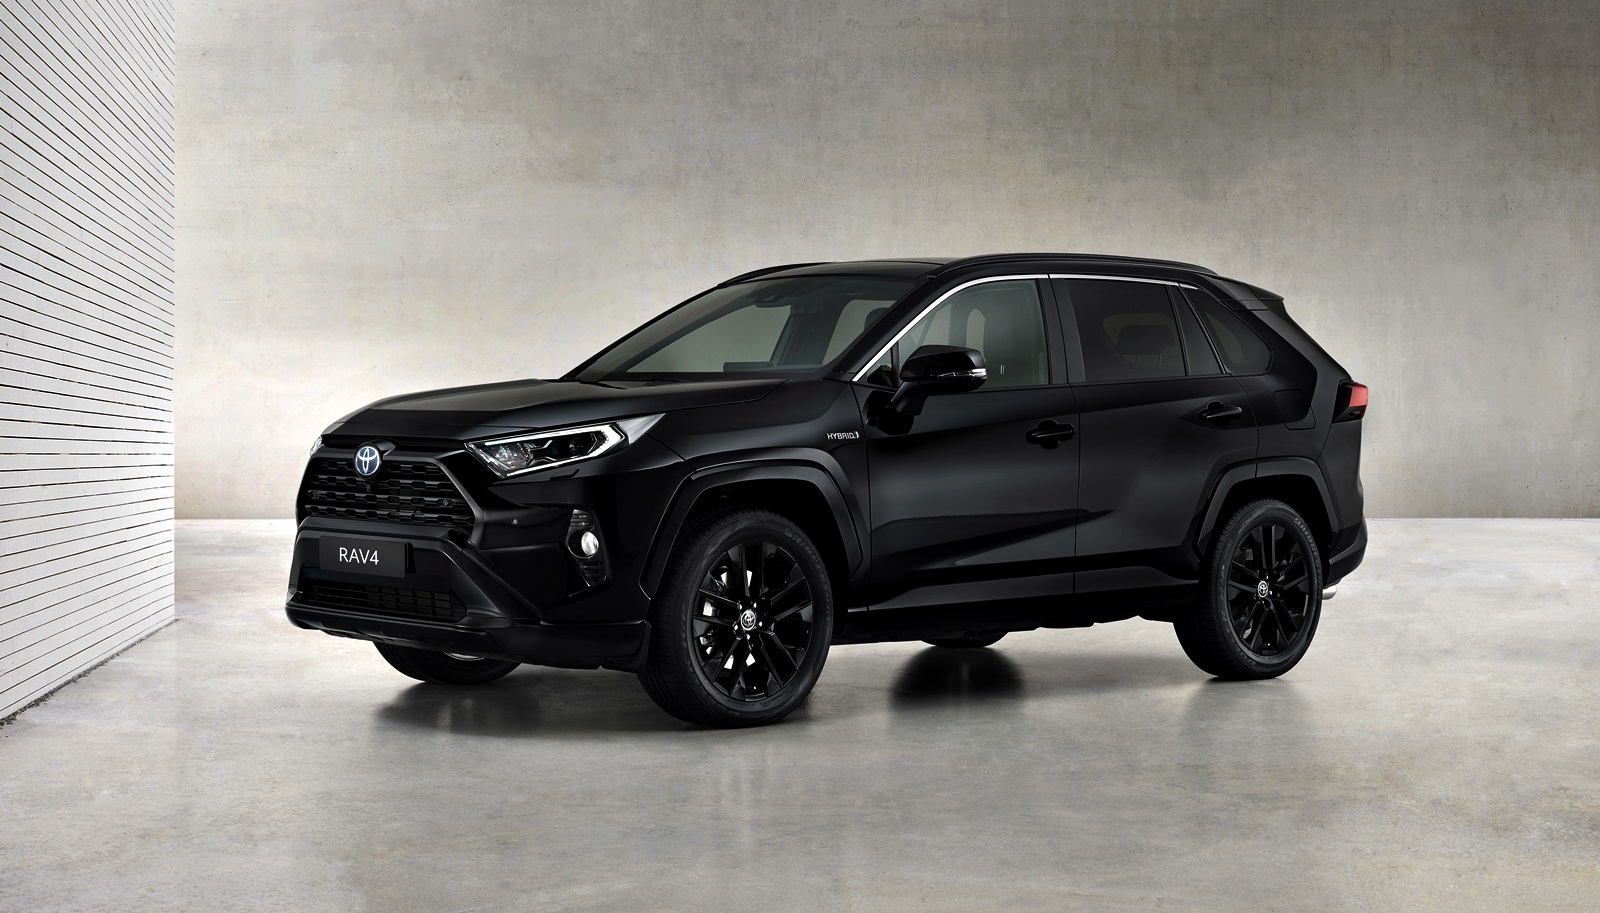 Toyota Rav4 Electric Hybrid Black Edition (1)